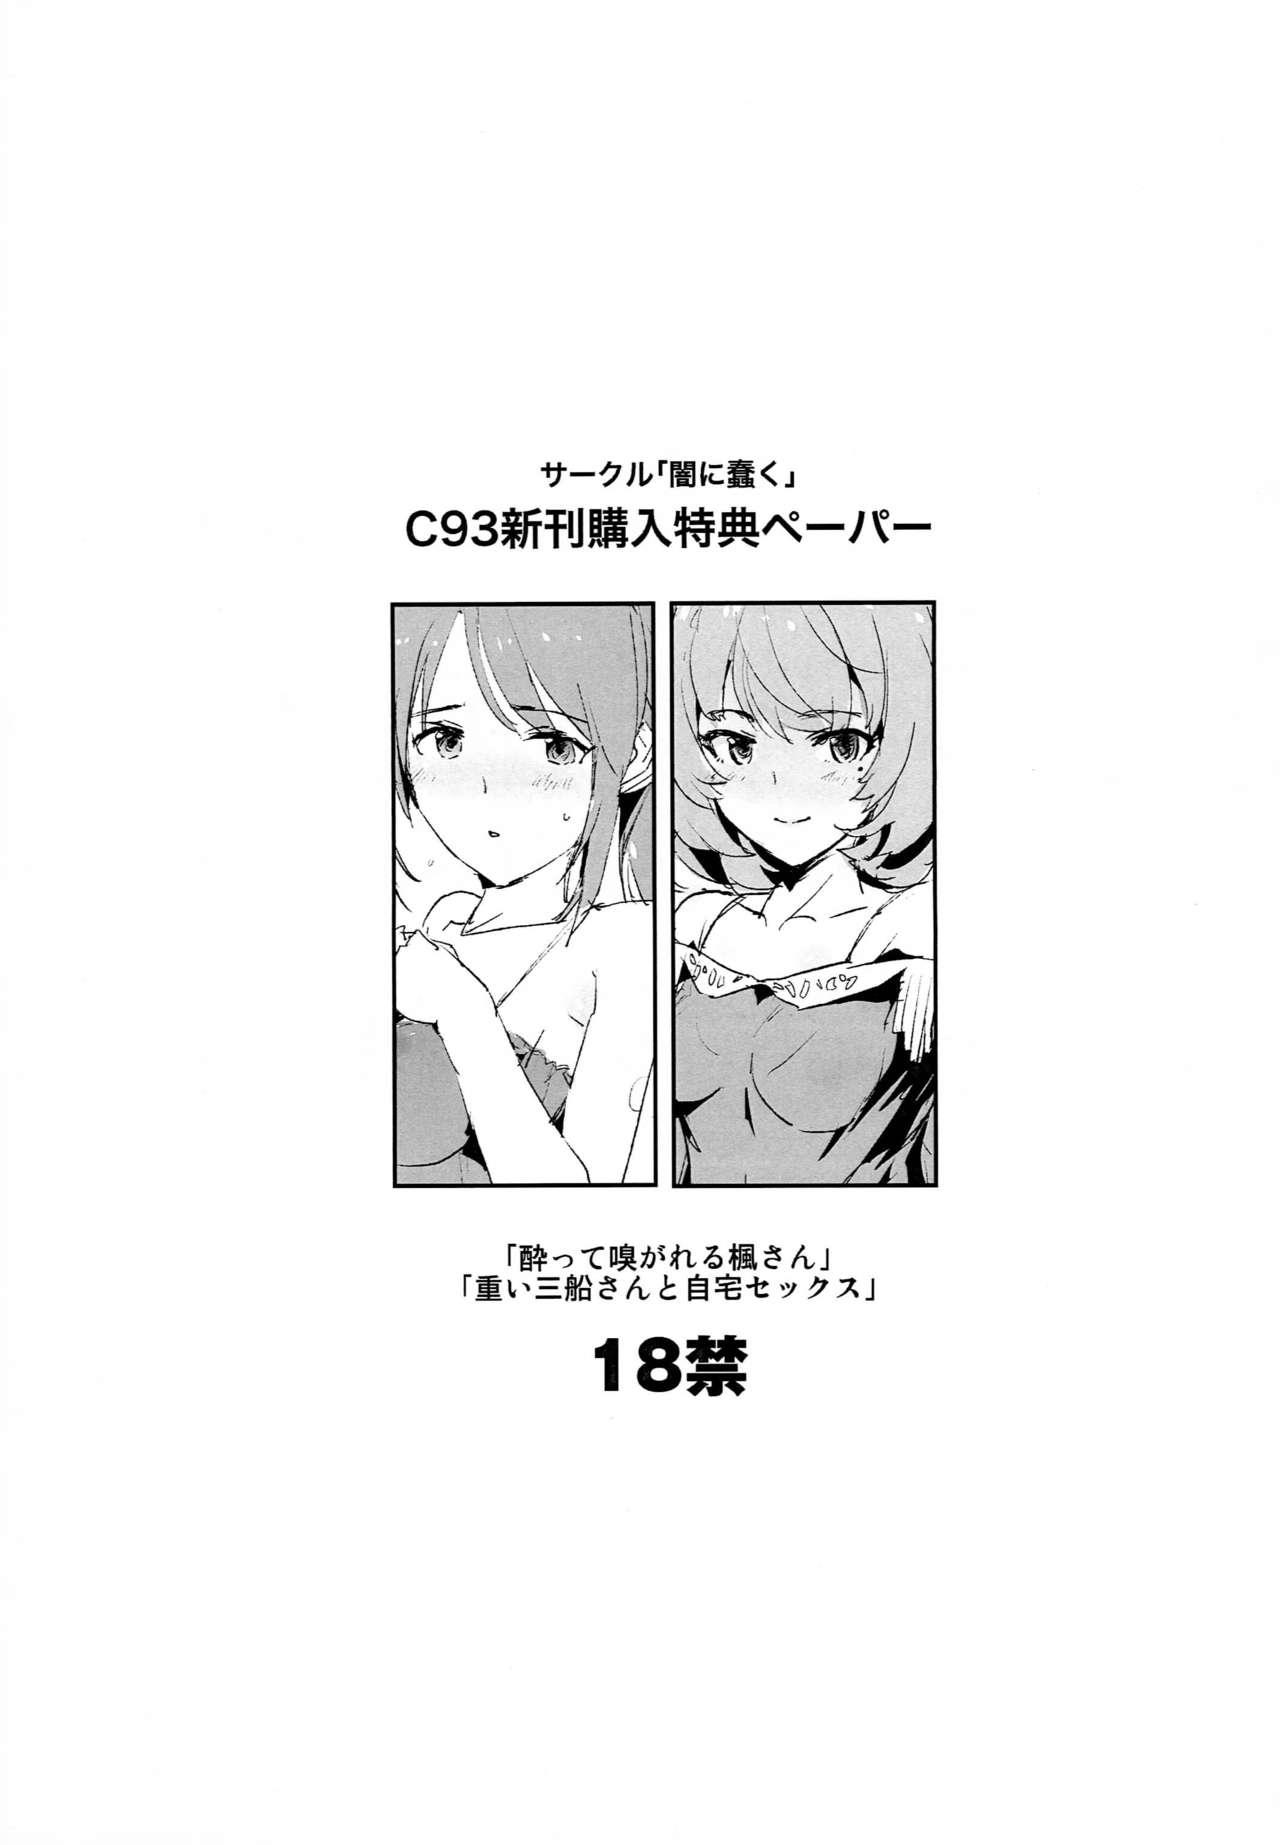 Tachibana Arisu no Saimin Dosukebe Sex Friends with Sagisawa Fumika + Omake Paper 24